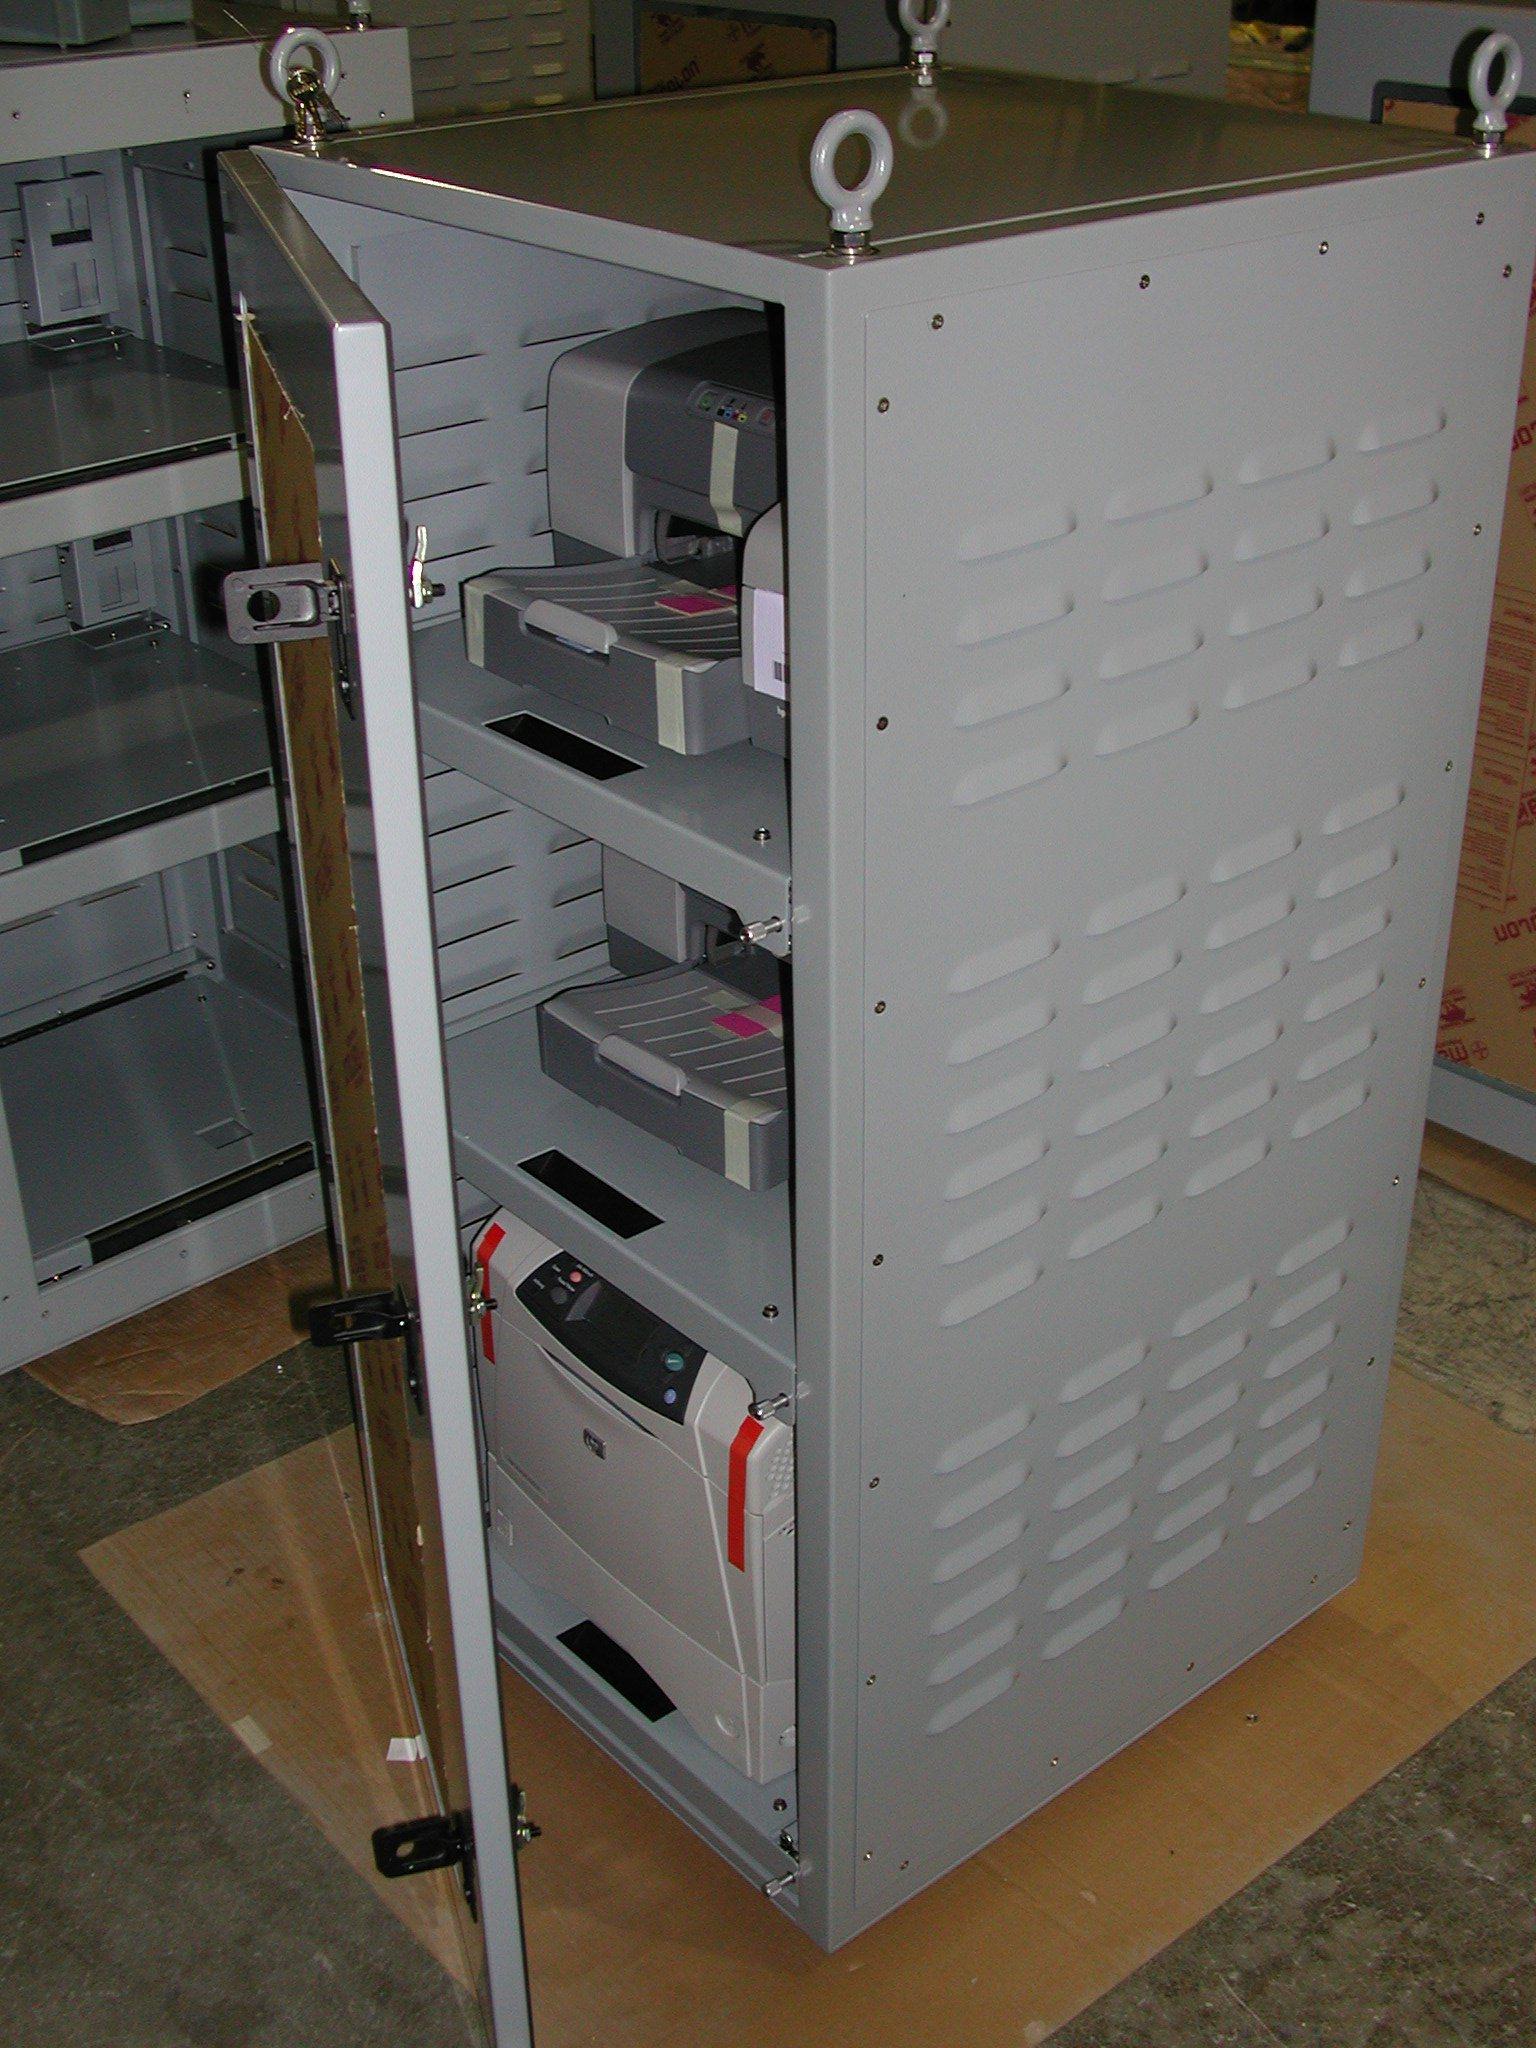 Metal Enclosures Millitary Hopewell Precision NY DSCN1638.JPG